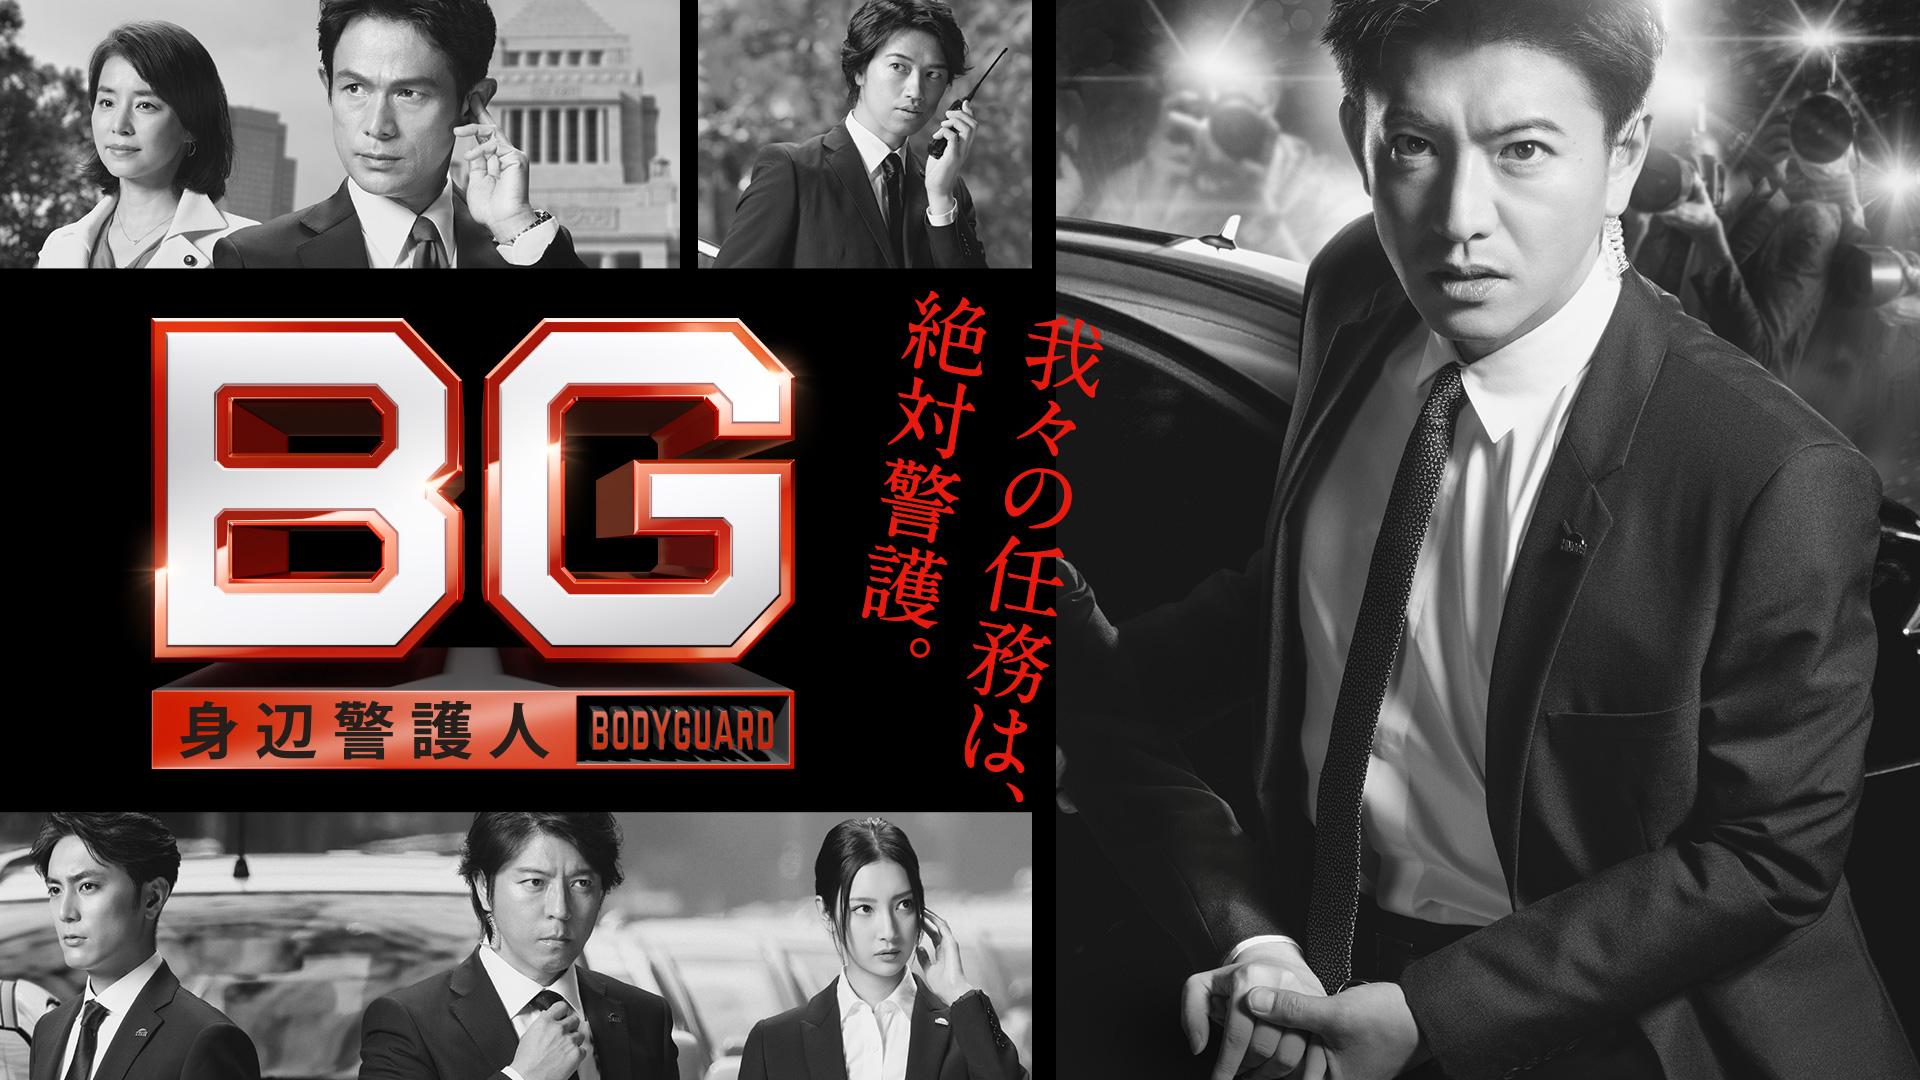 BG身辺警護人(2018)